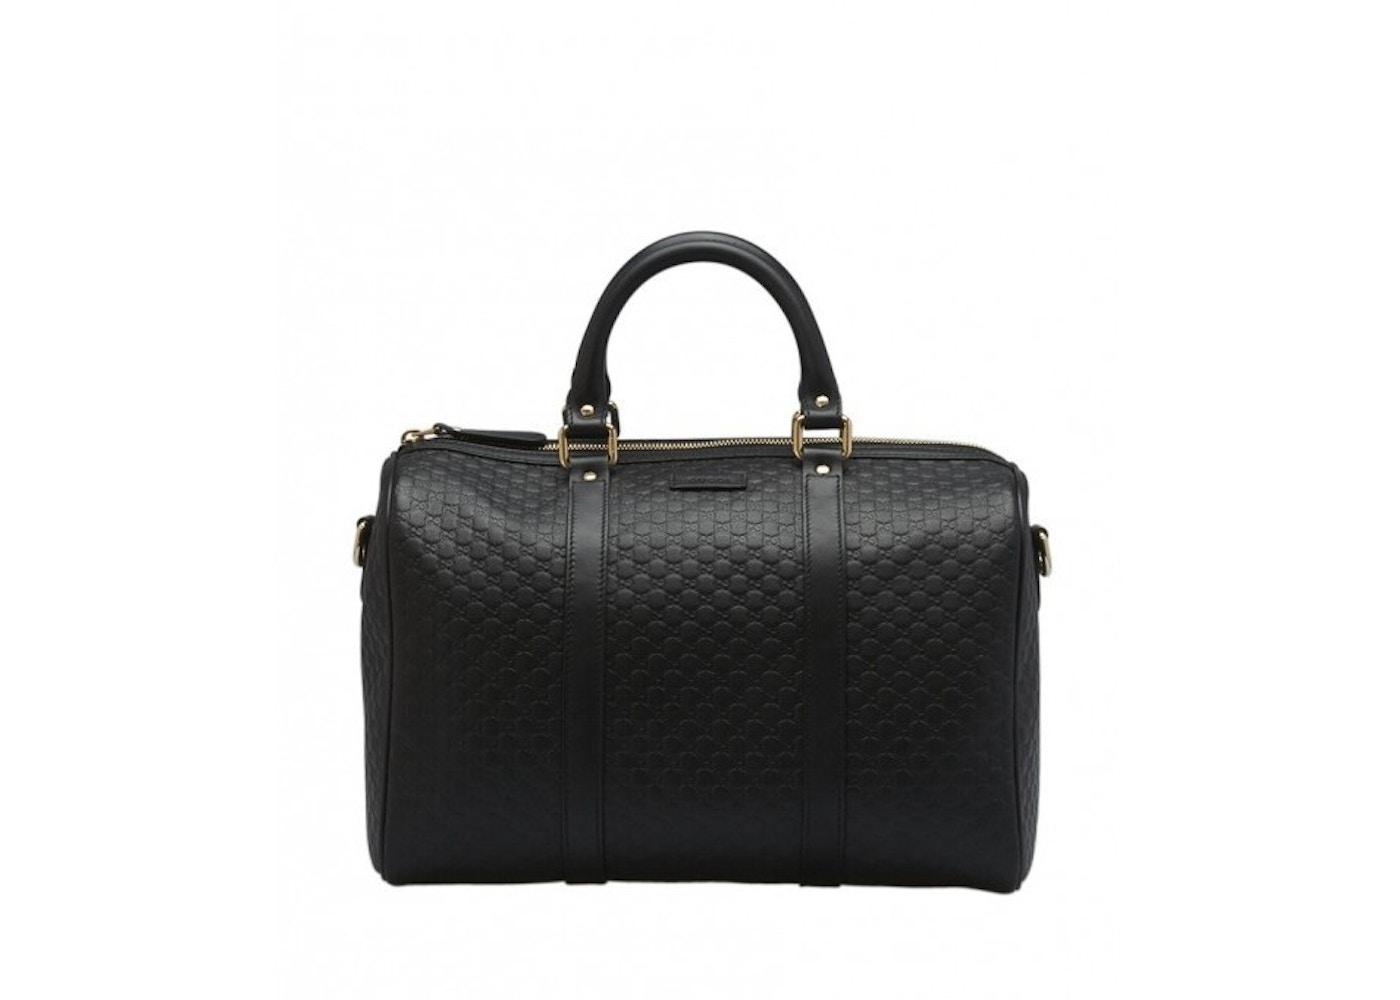 Gucci Boston Bag Satchel